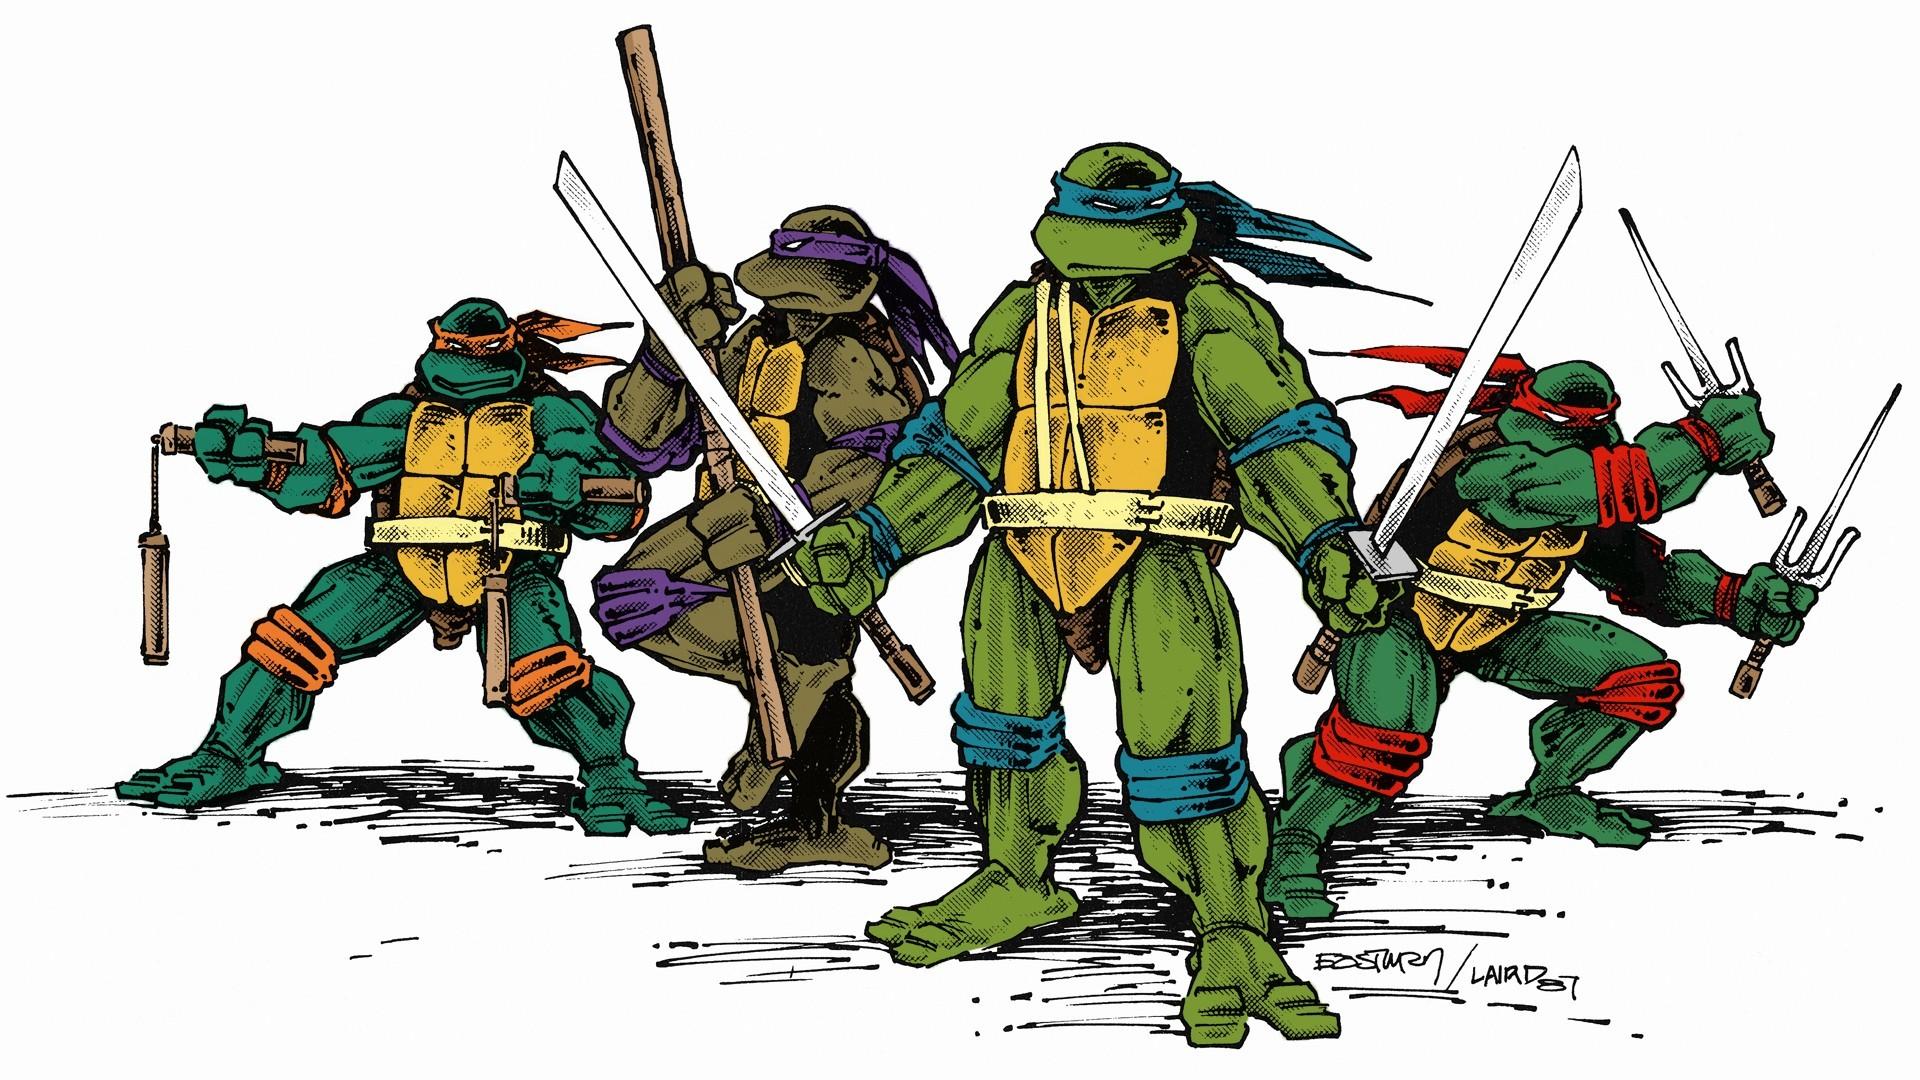 Teenage Mutant Ninja Turtles wallpaper     214746   WallpaperUP